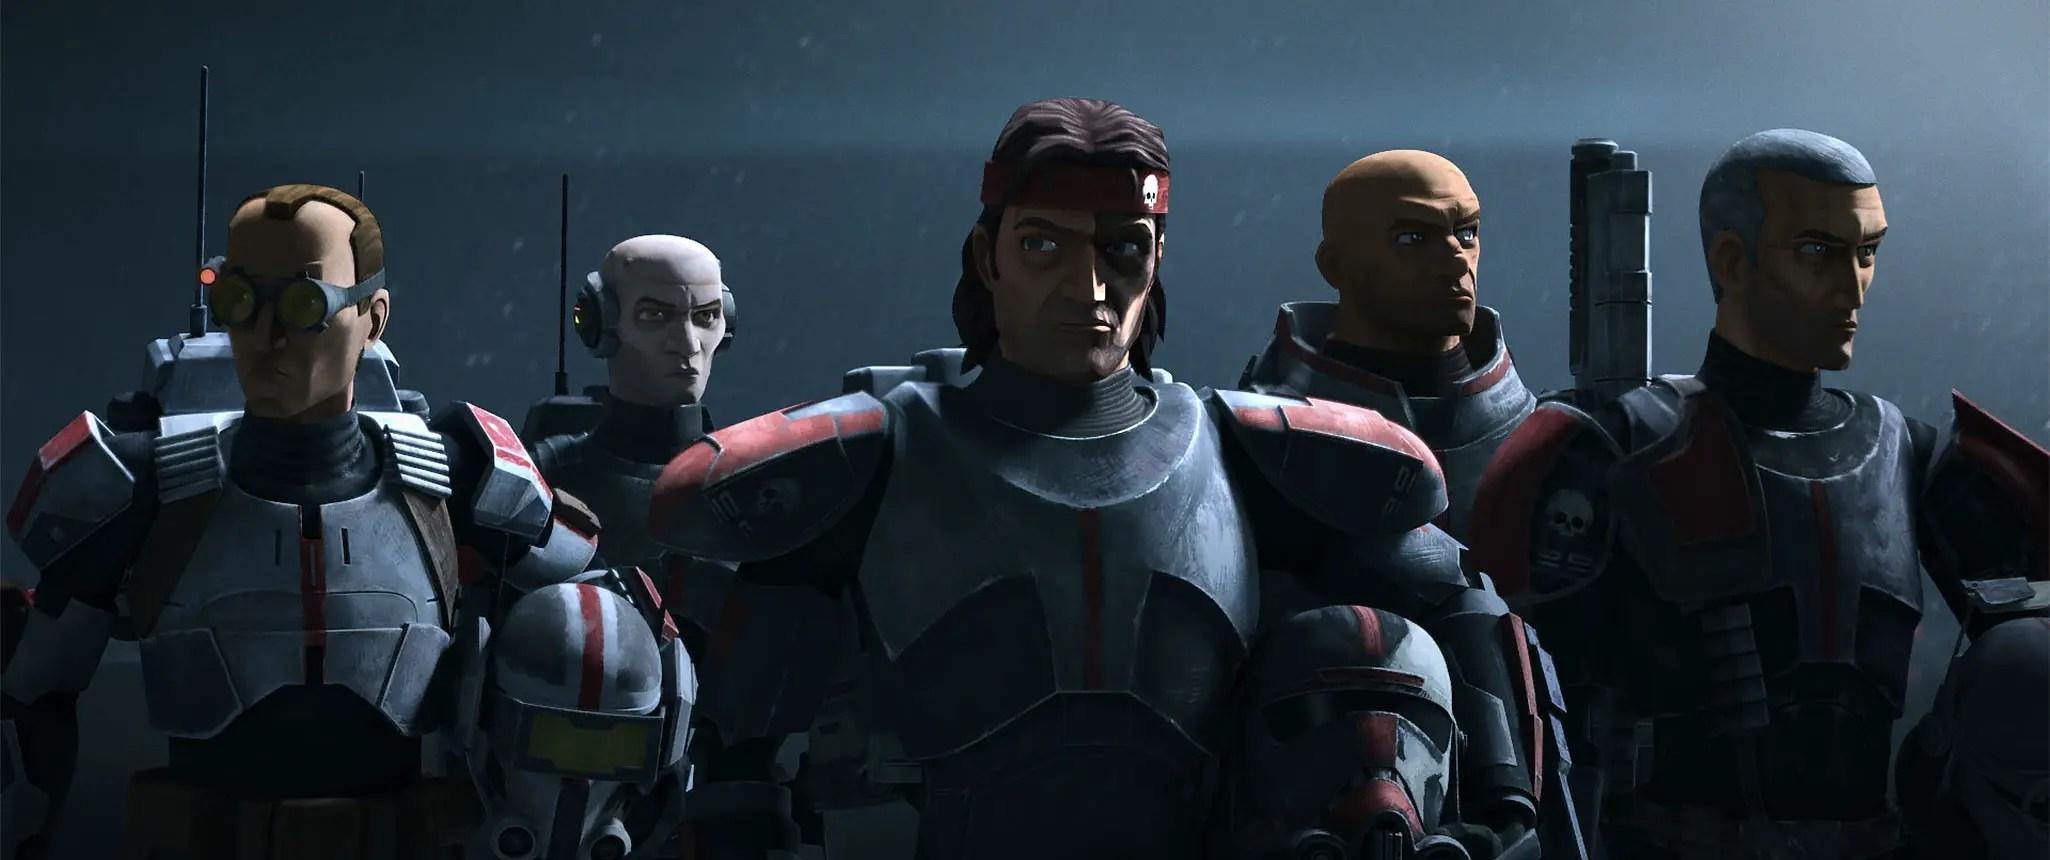 'Star Wars: The Bad Batch' season 1 episode 1 'Aftermath' recap/review